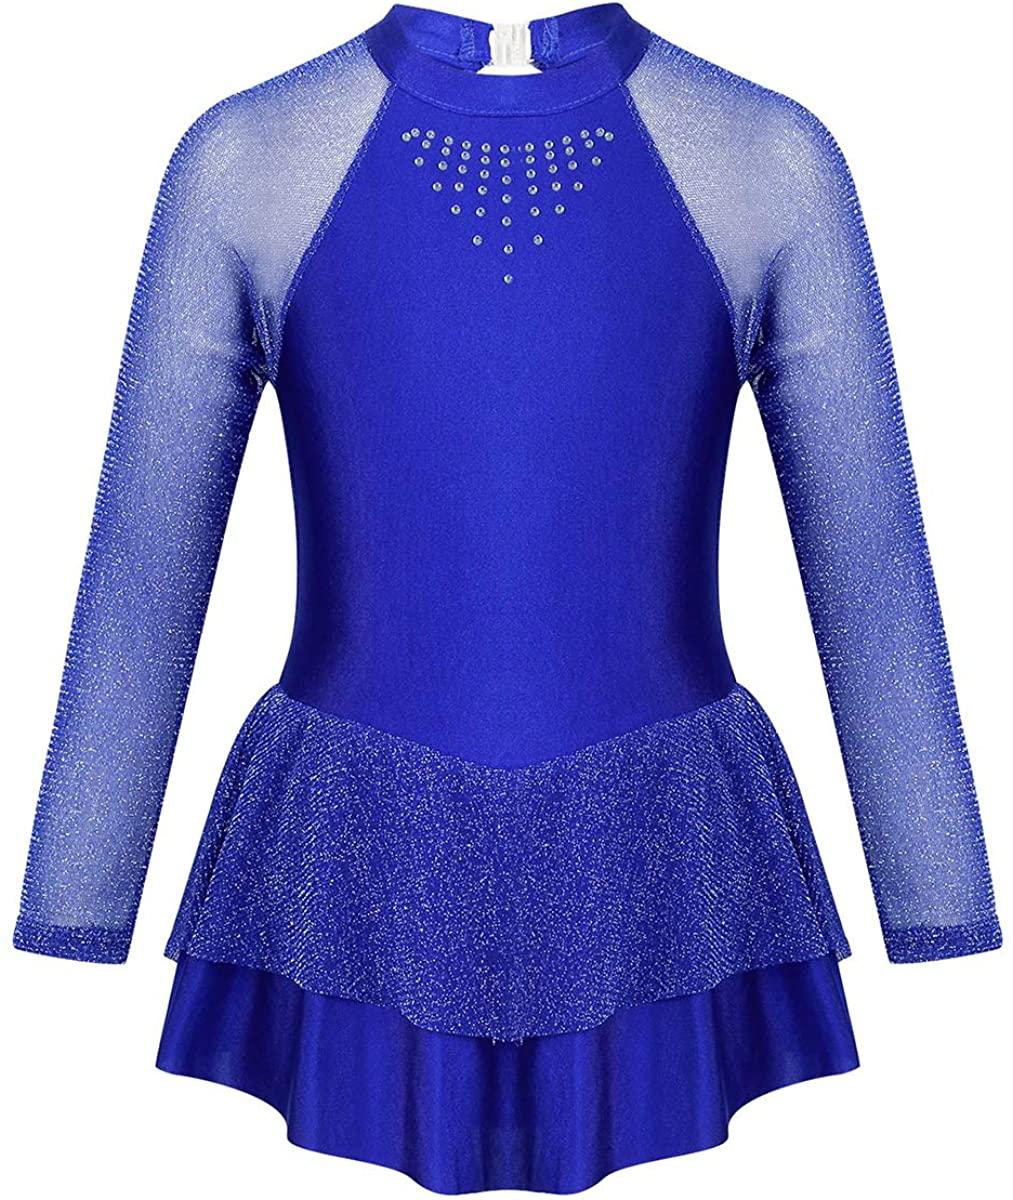 inhzoy Kids Girls Lycra Long Sleeves Figure Ice Skating Dress Mock Neck Cutouts Ballet Dance Leotard Dancewear